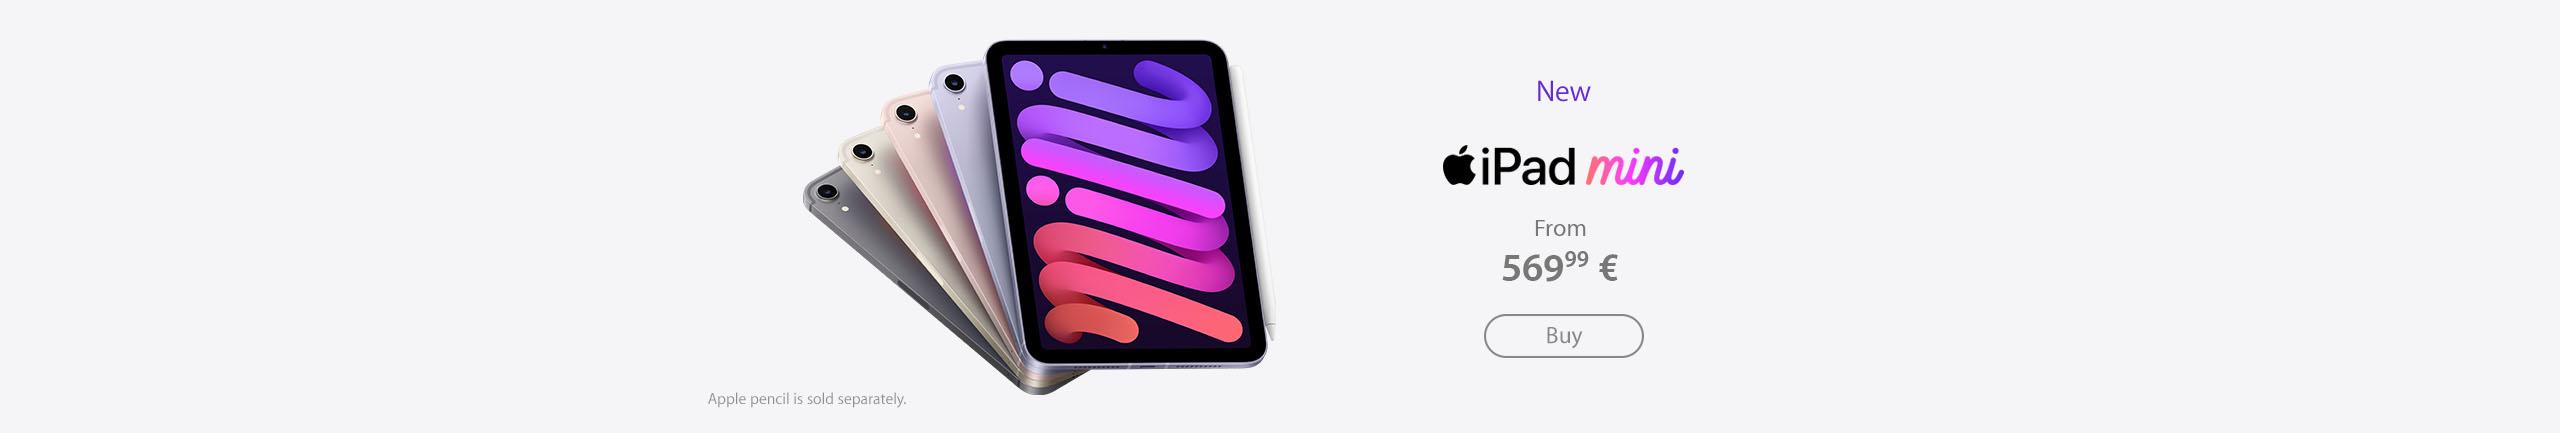 NPL Buy new Apple iPad mini